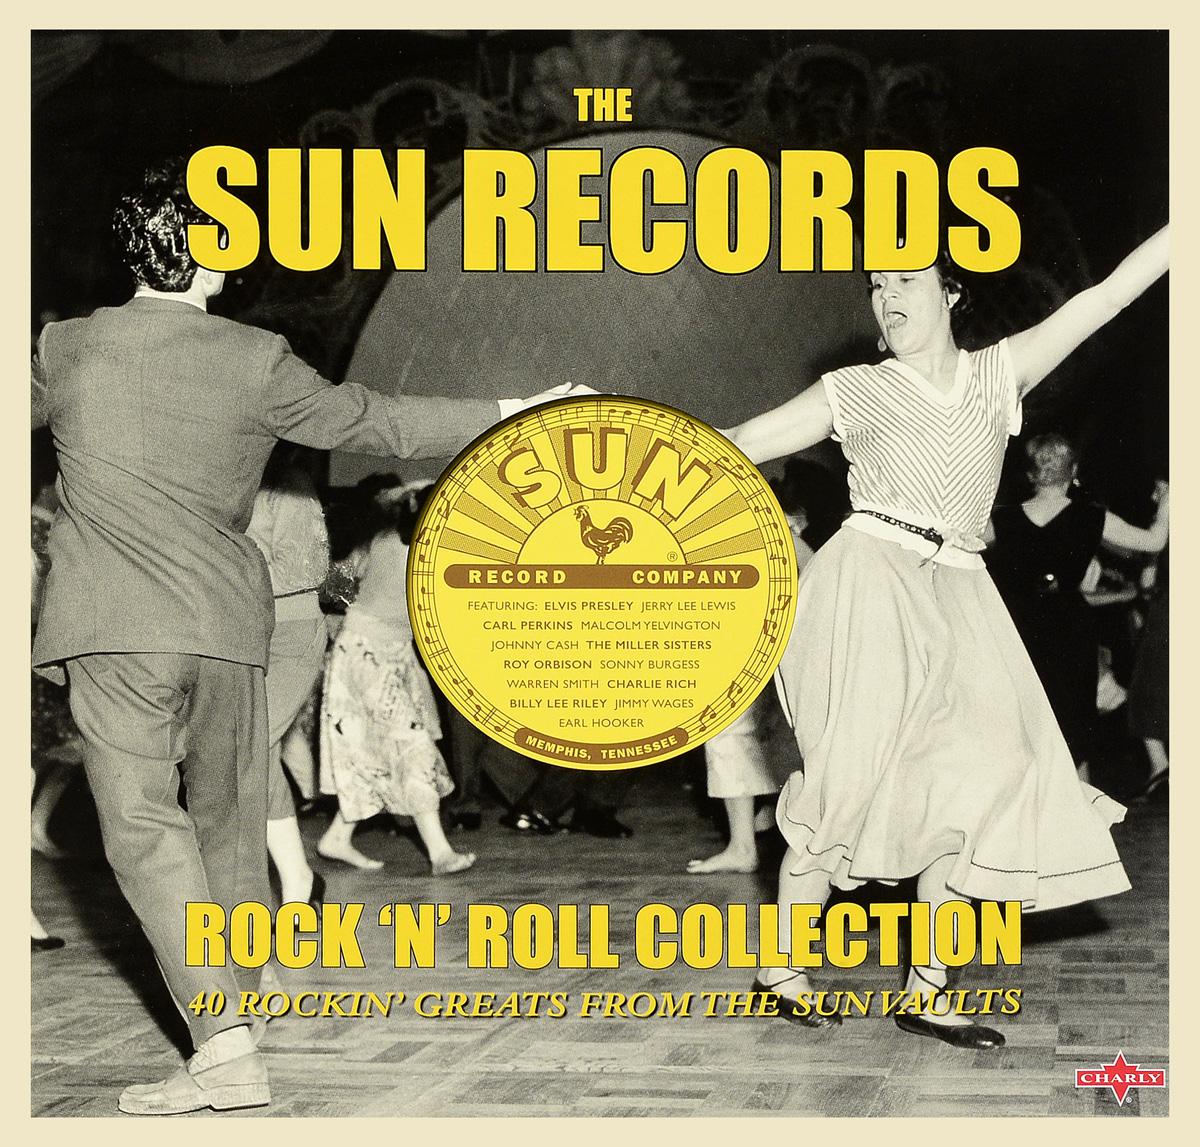 Элвис Пресли,Рой Орбисон,Карл Перкинс Sun Records - Rock'n'Roll Collection (2 LP) рой орбисон хэнк уильямс старший roy orbison the mgm years 13 cd